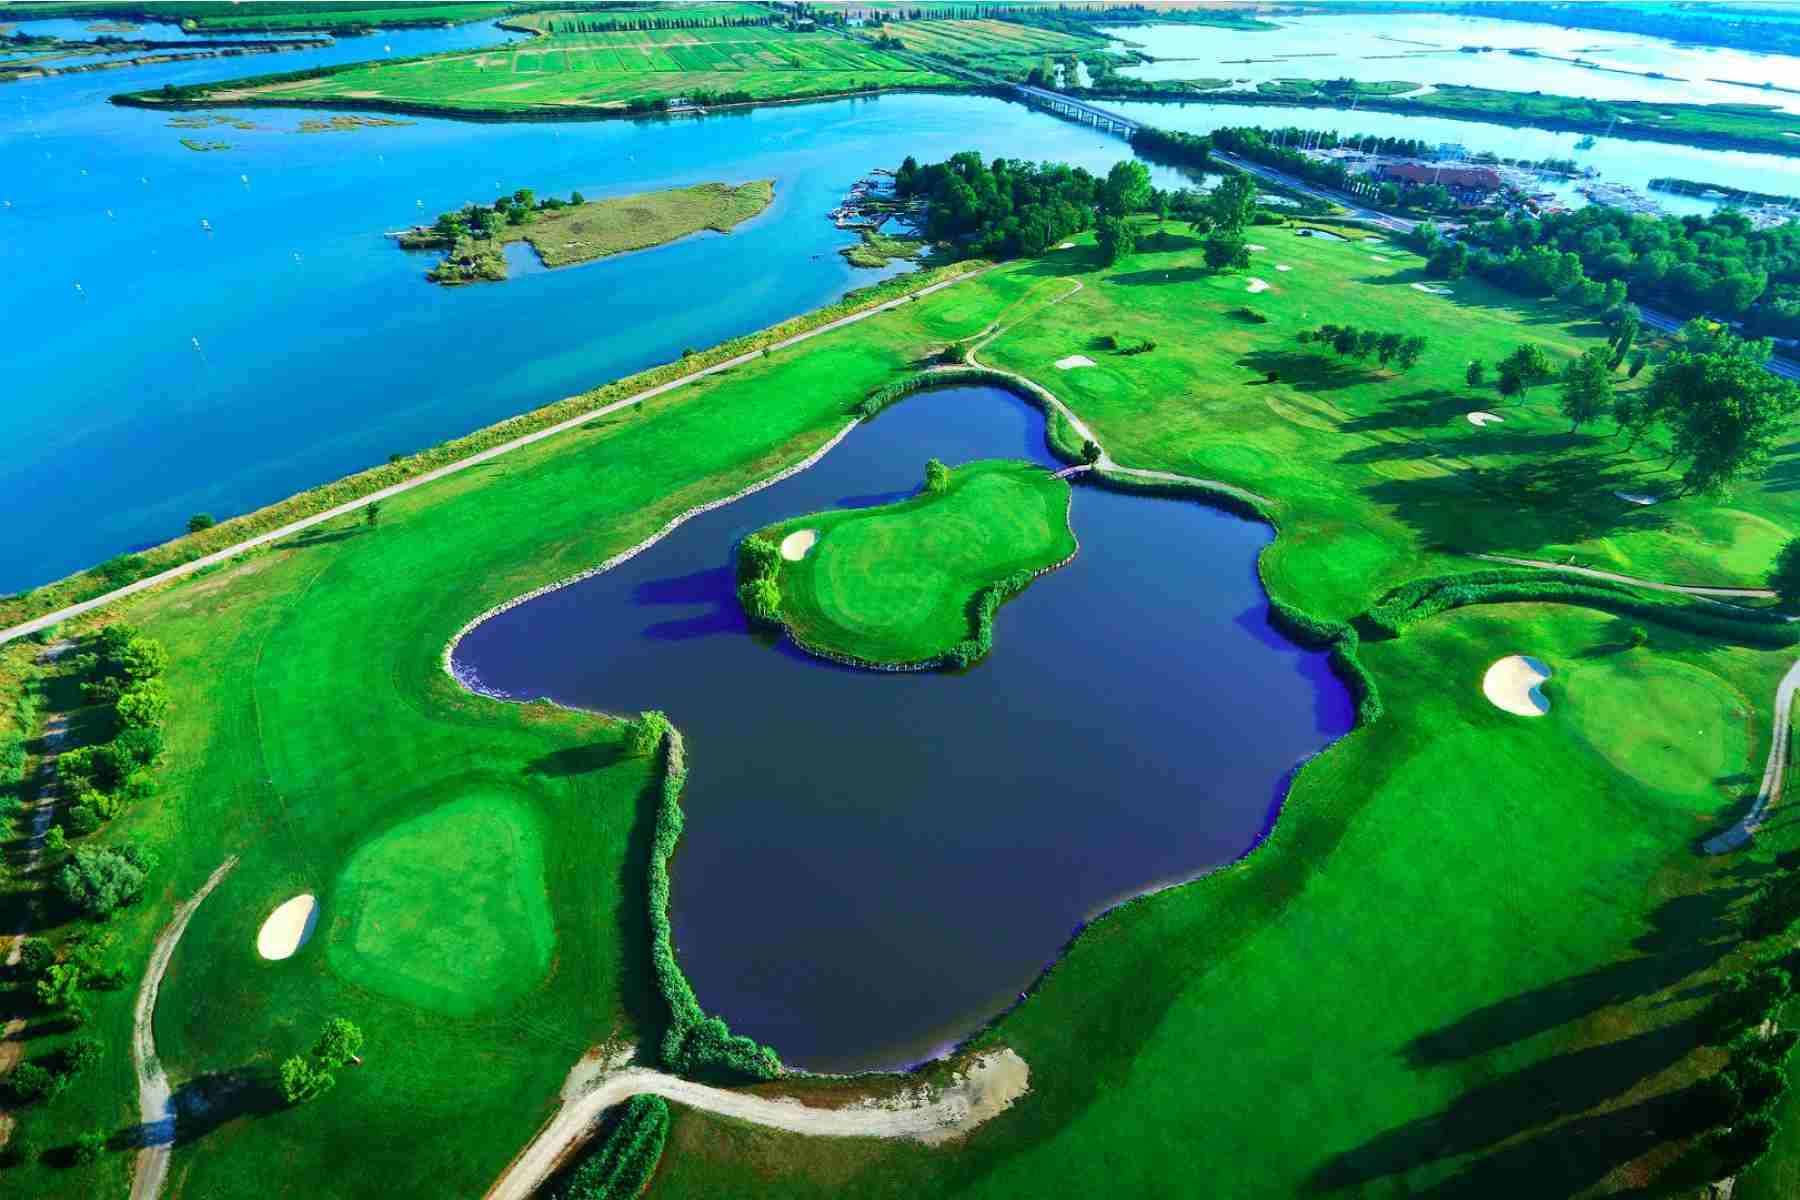 Golf tour in Friuli Venezia Giulia: Collio, Udine, Trieste and Grado - 8 days /7 nights - 4 Rounds in 4 different Golf Courses Wedding Package